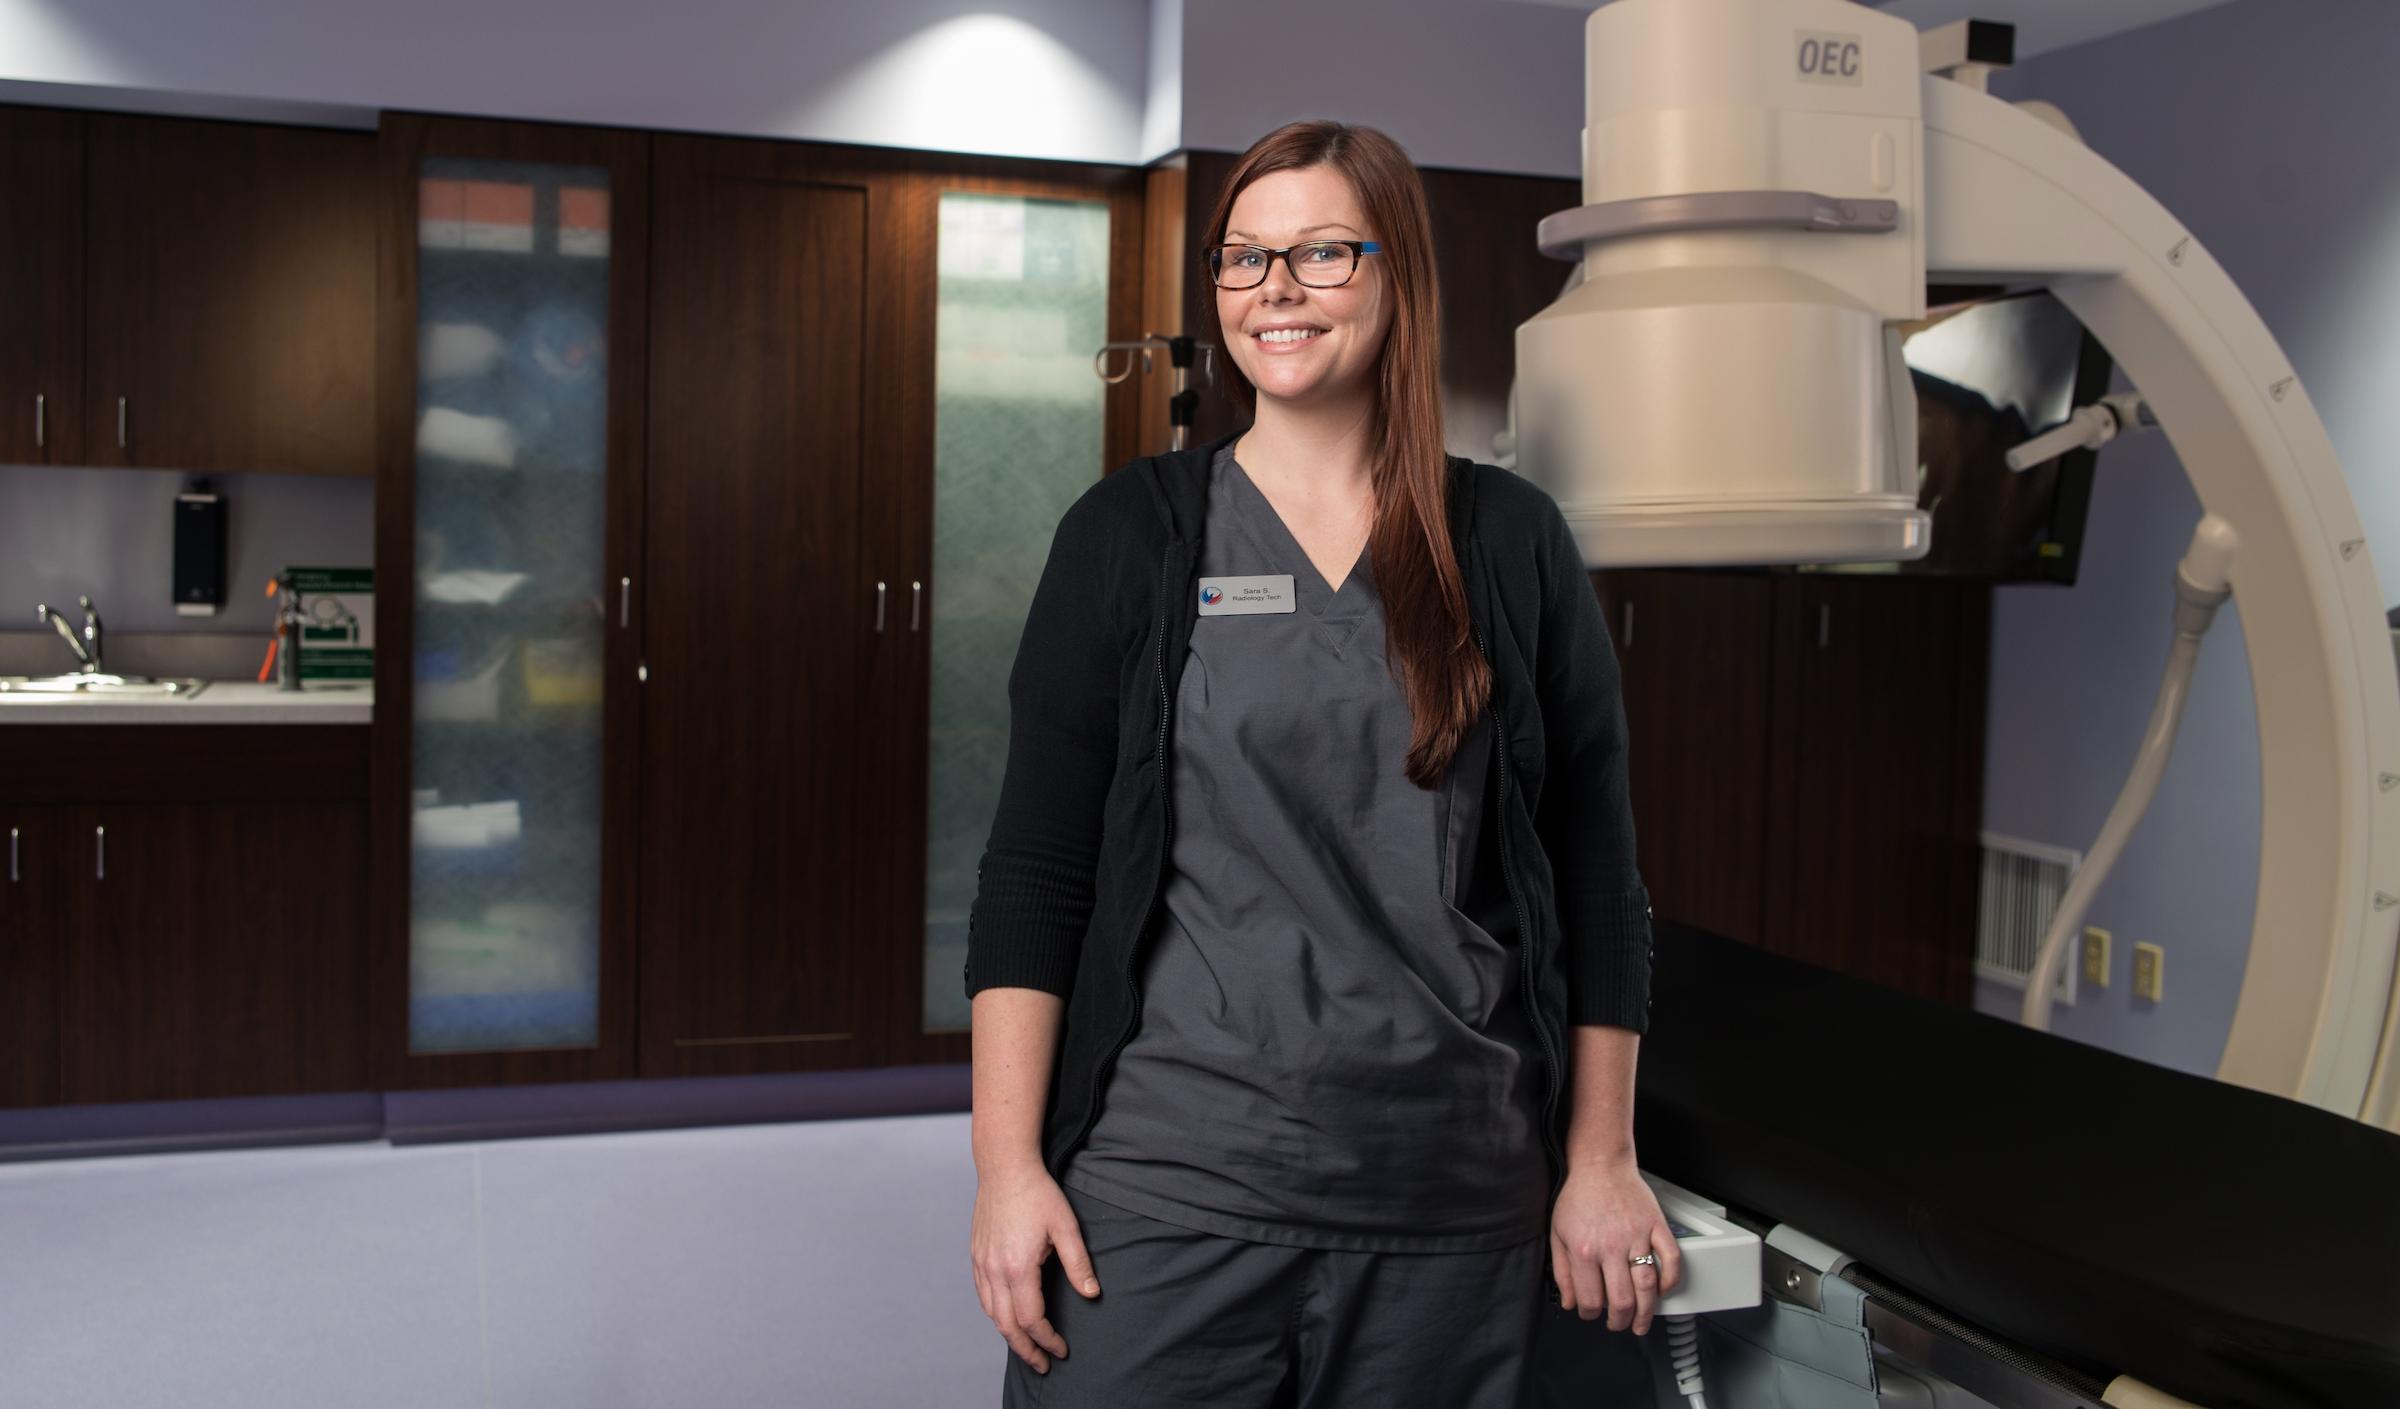 Sara Smarcz R.T. - vascular radiologic technologist